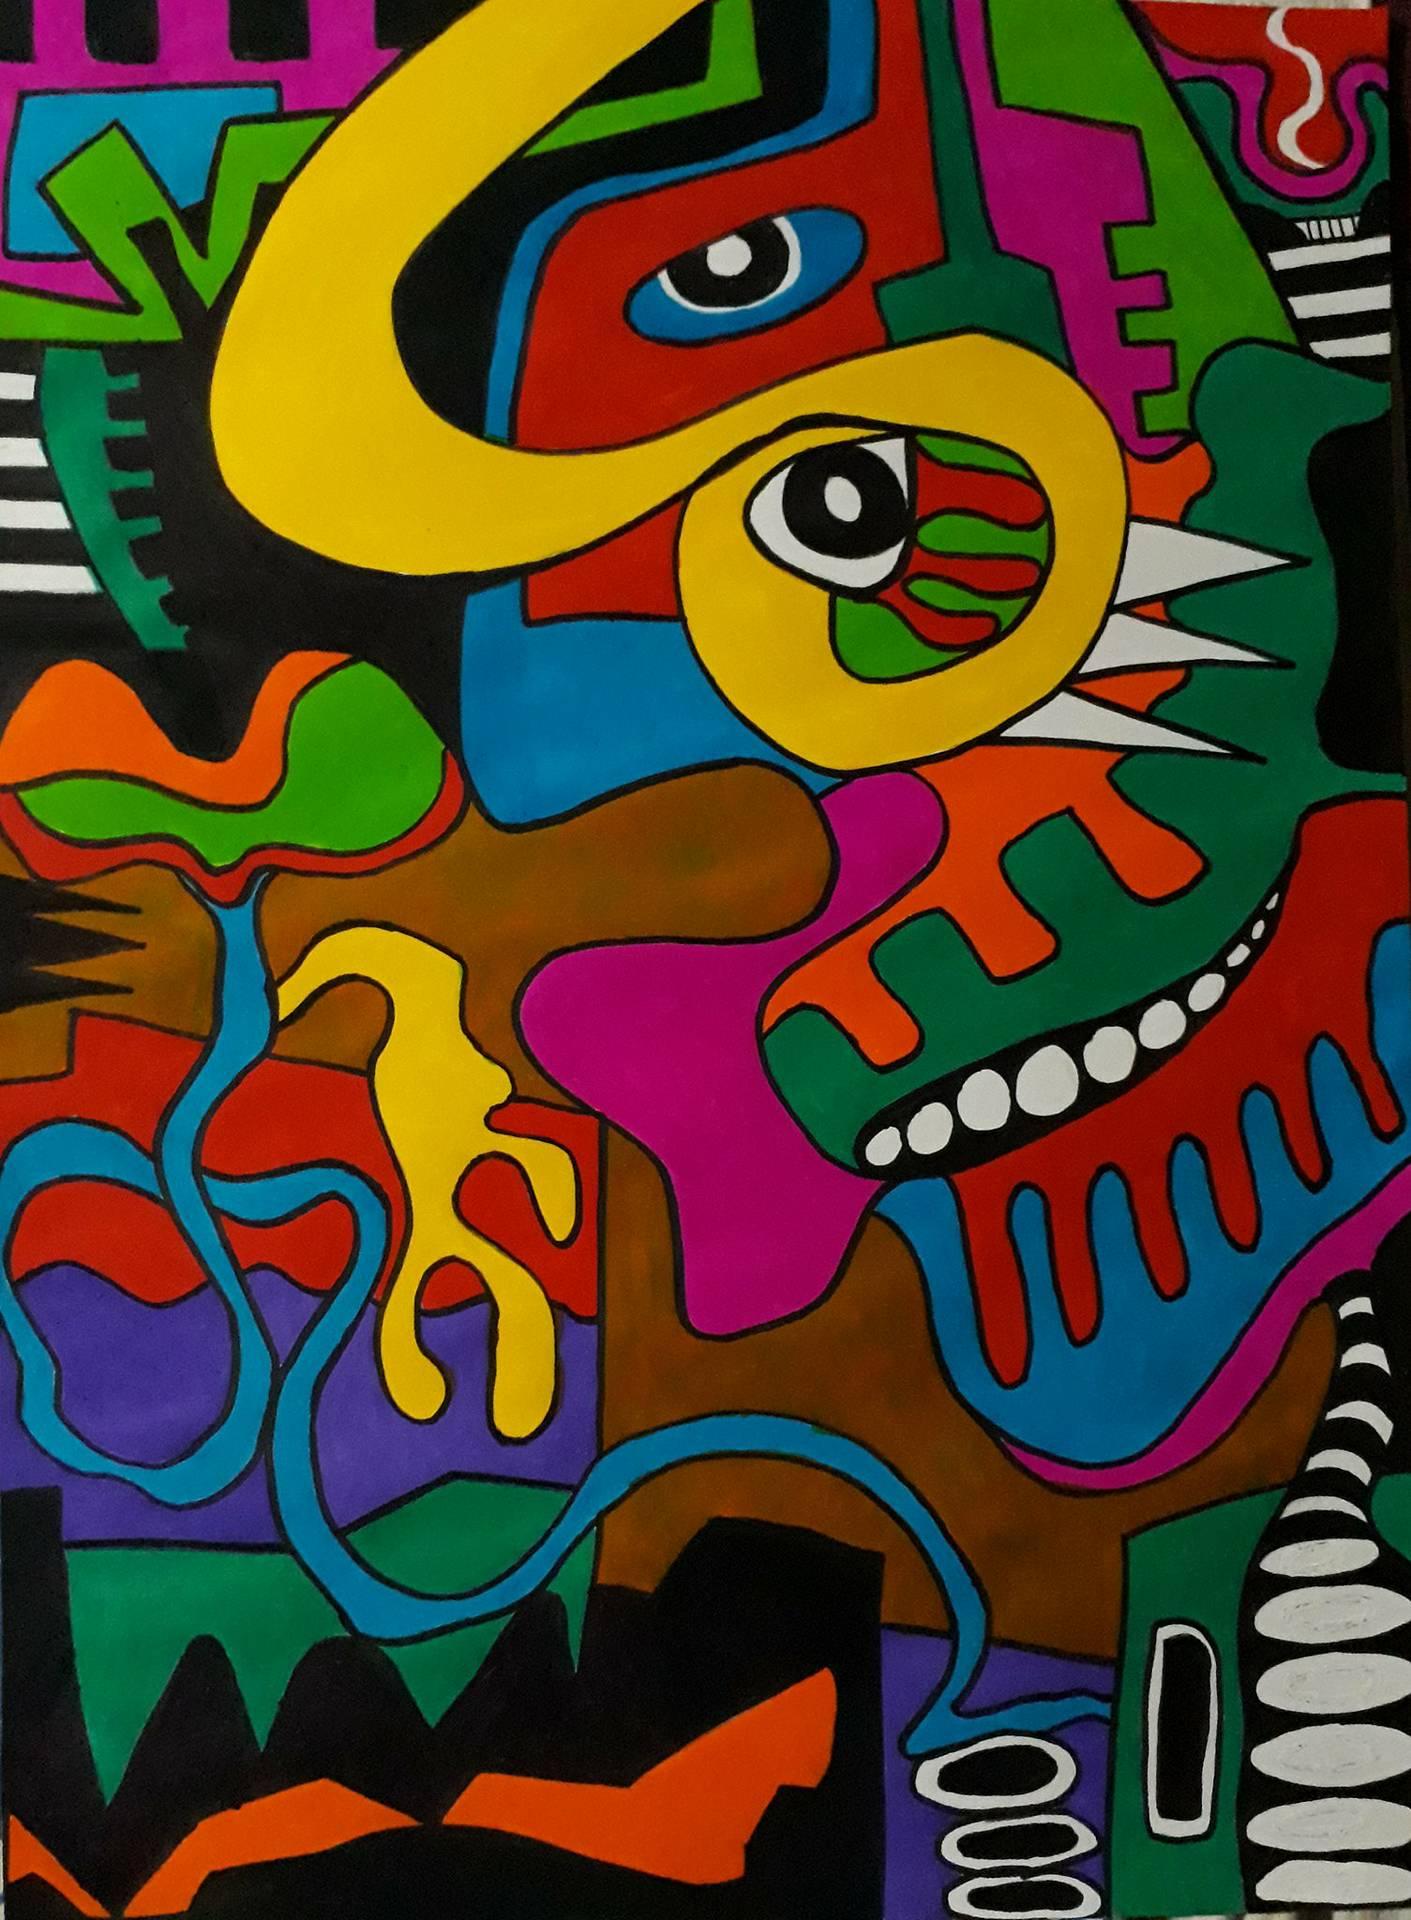 Laughing Skull, dipinto di Somnath Basuthakur